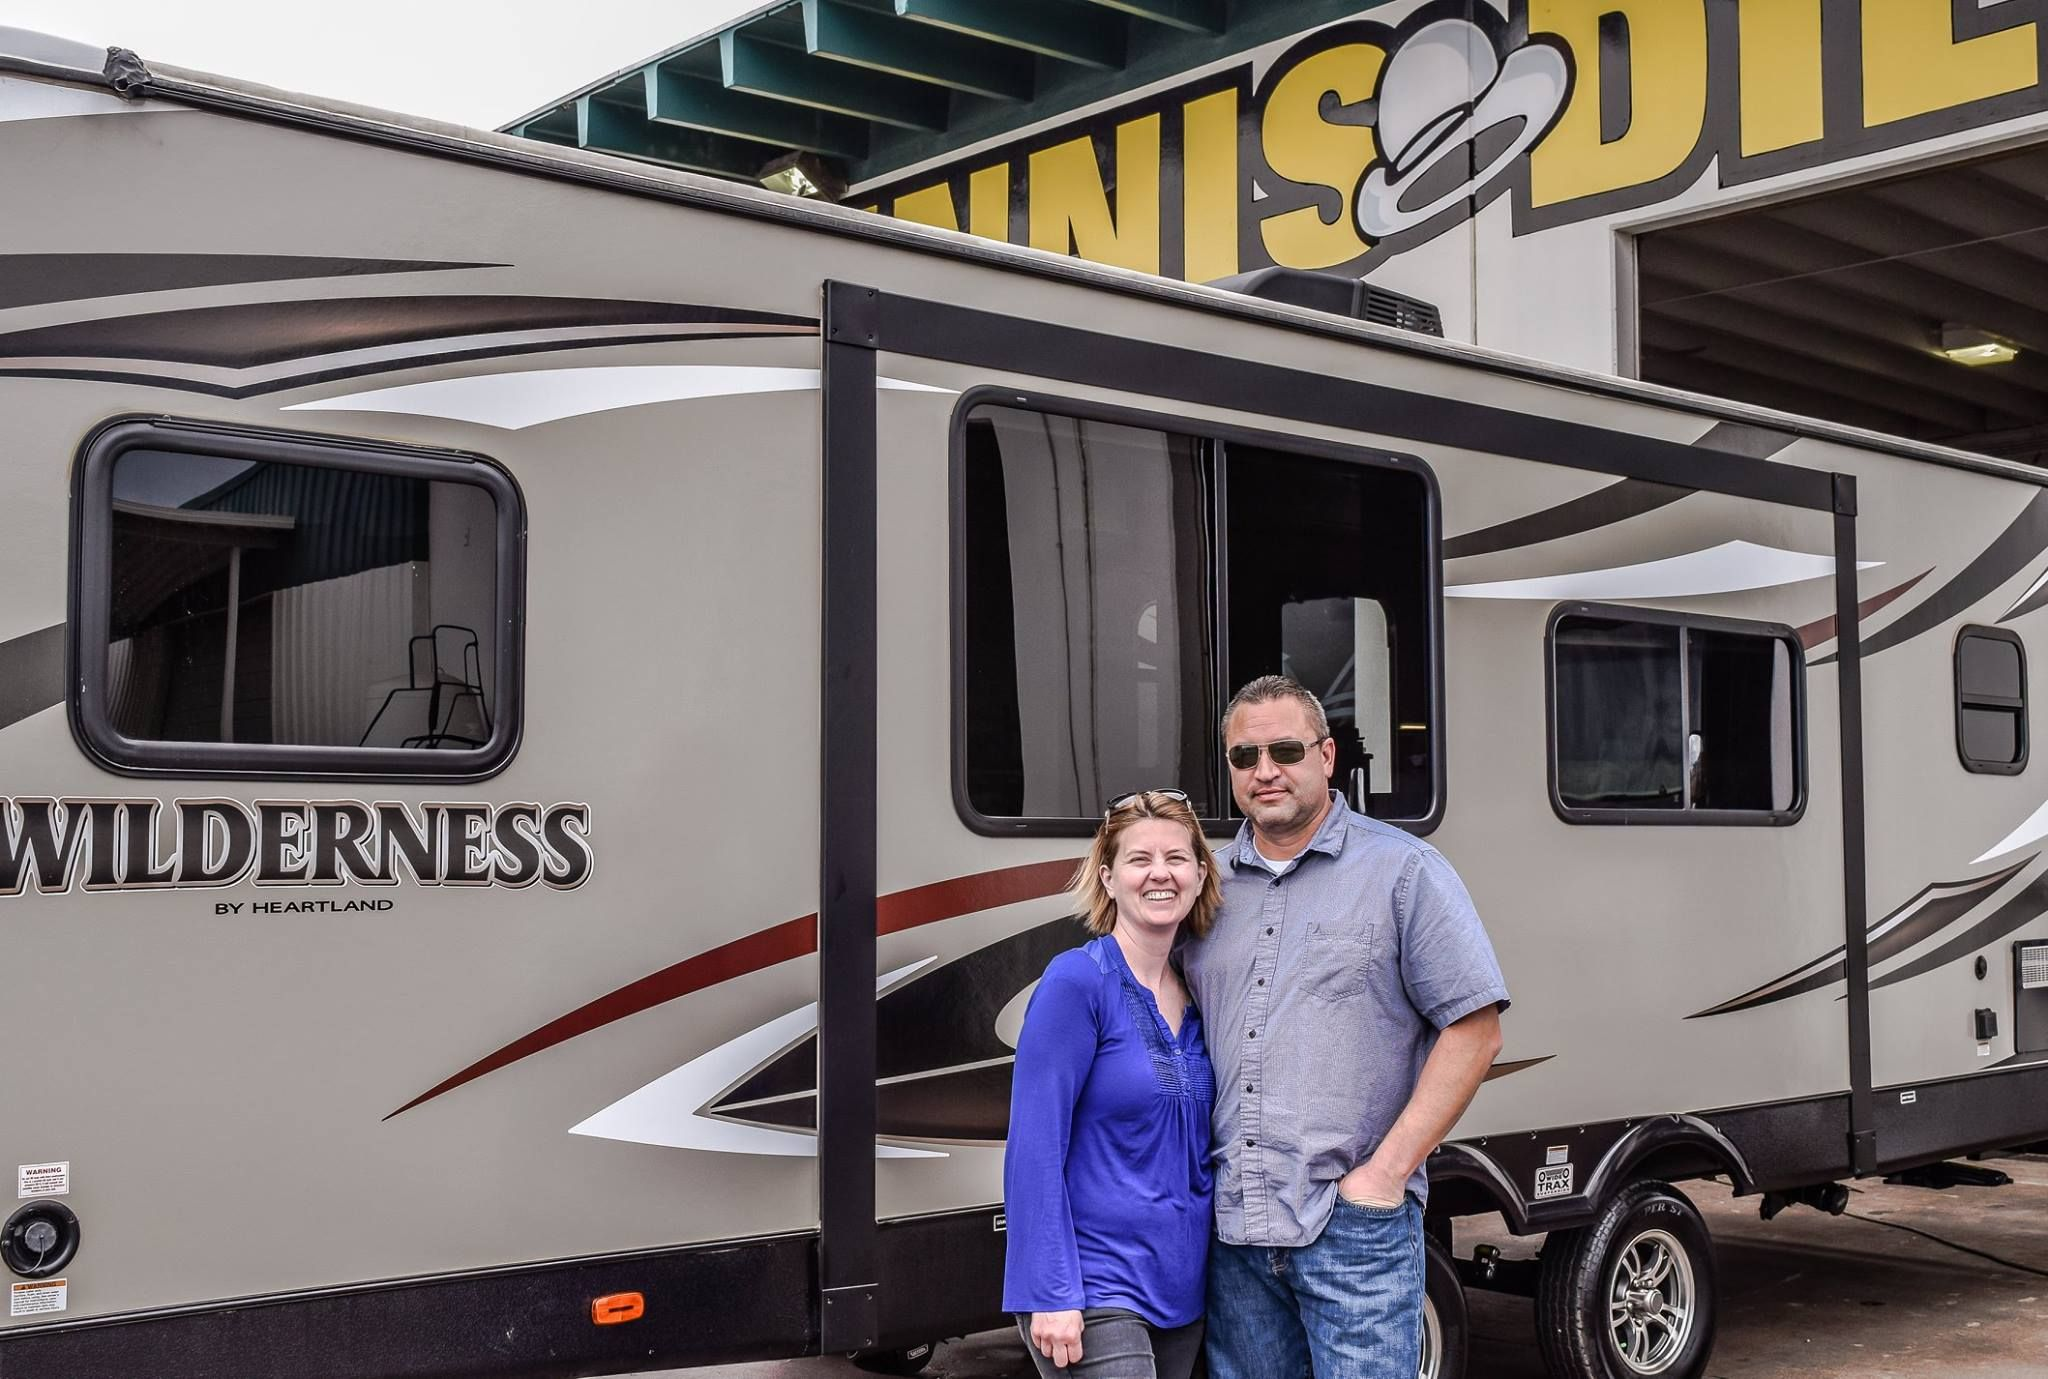 Wilderness Cheap Travel Insurance Affordable Honeymoon Wilderness